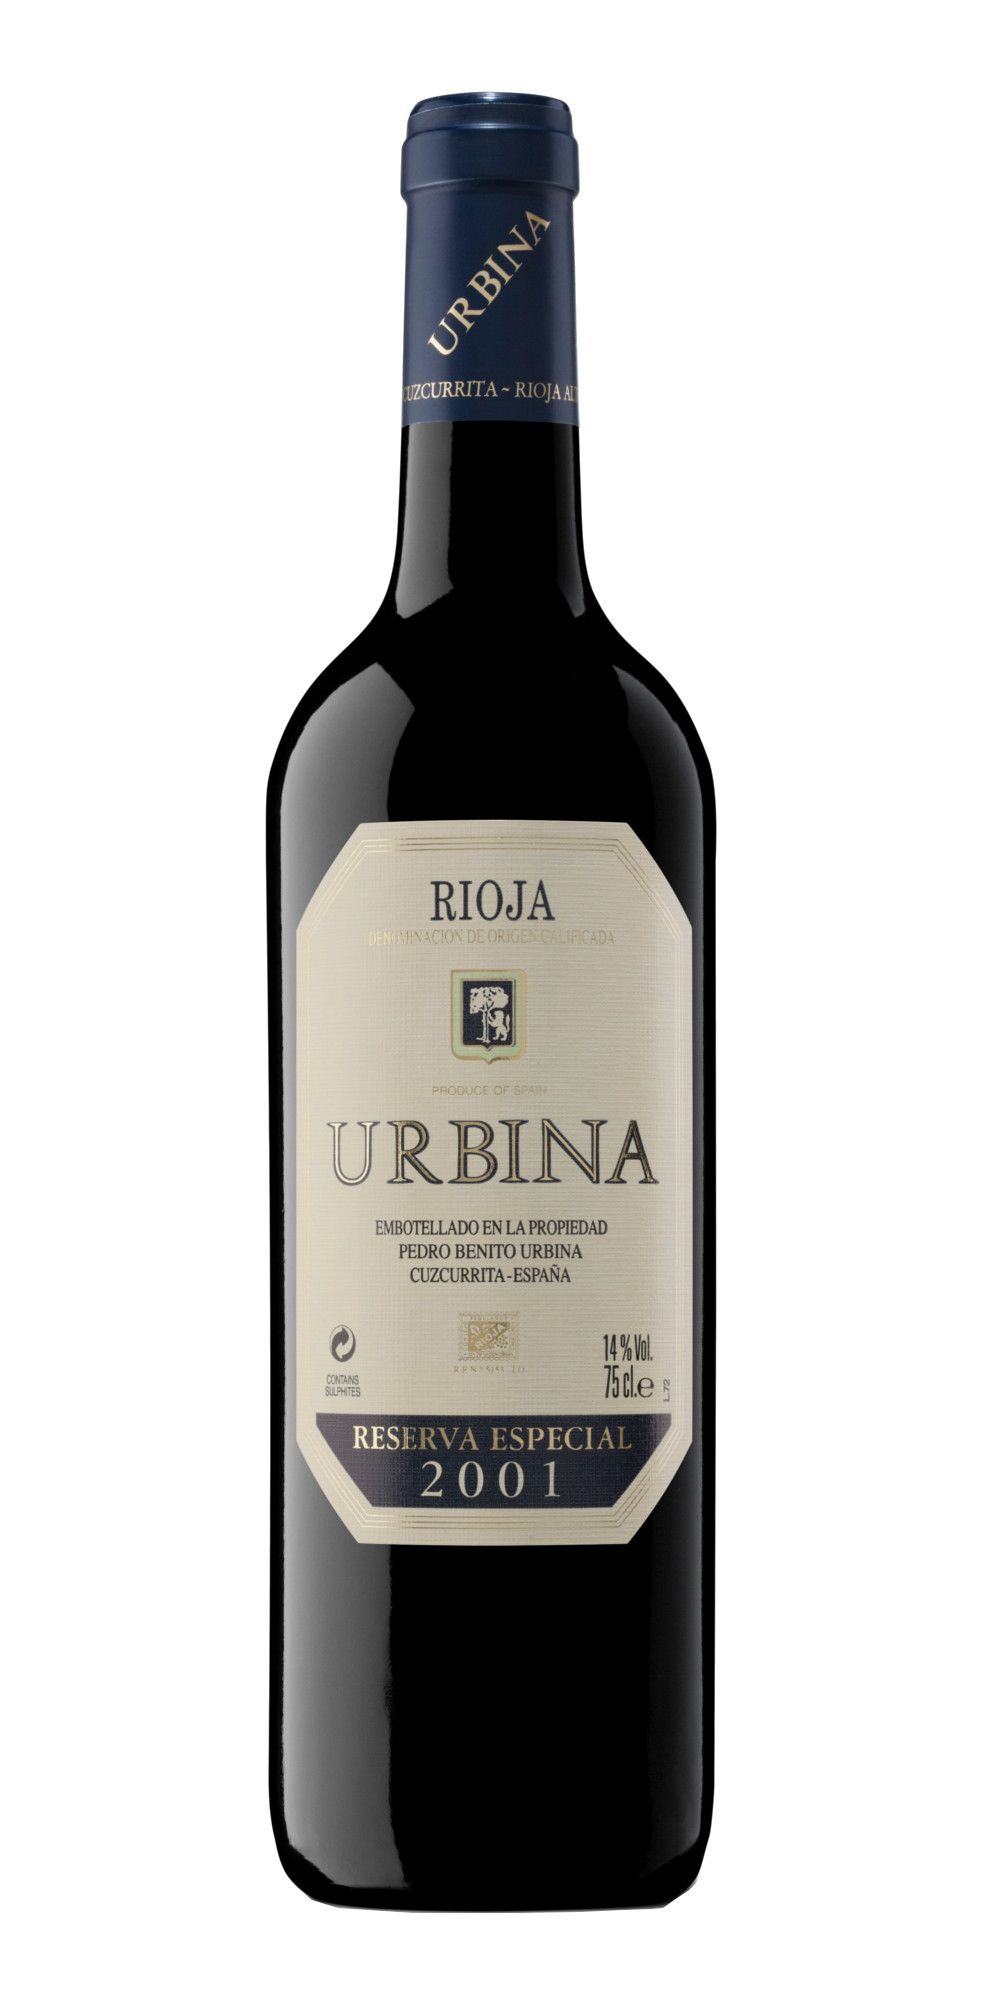 Botella Urbina Reserva Especial 2001 Tempranillo Doc Rioja Comprar